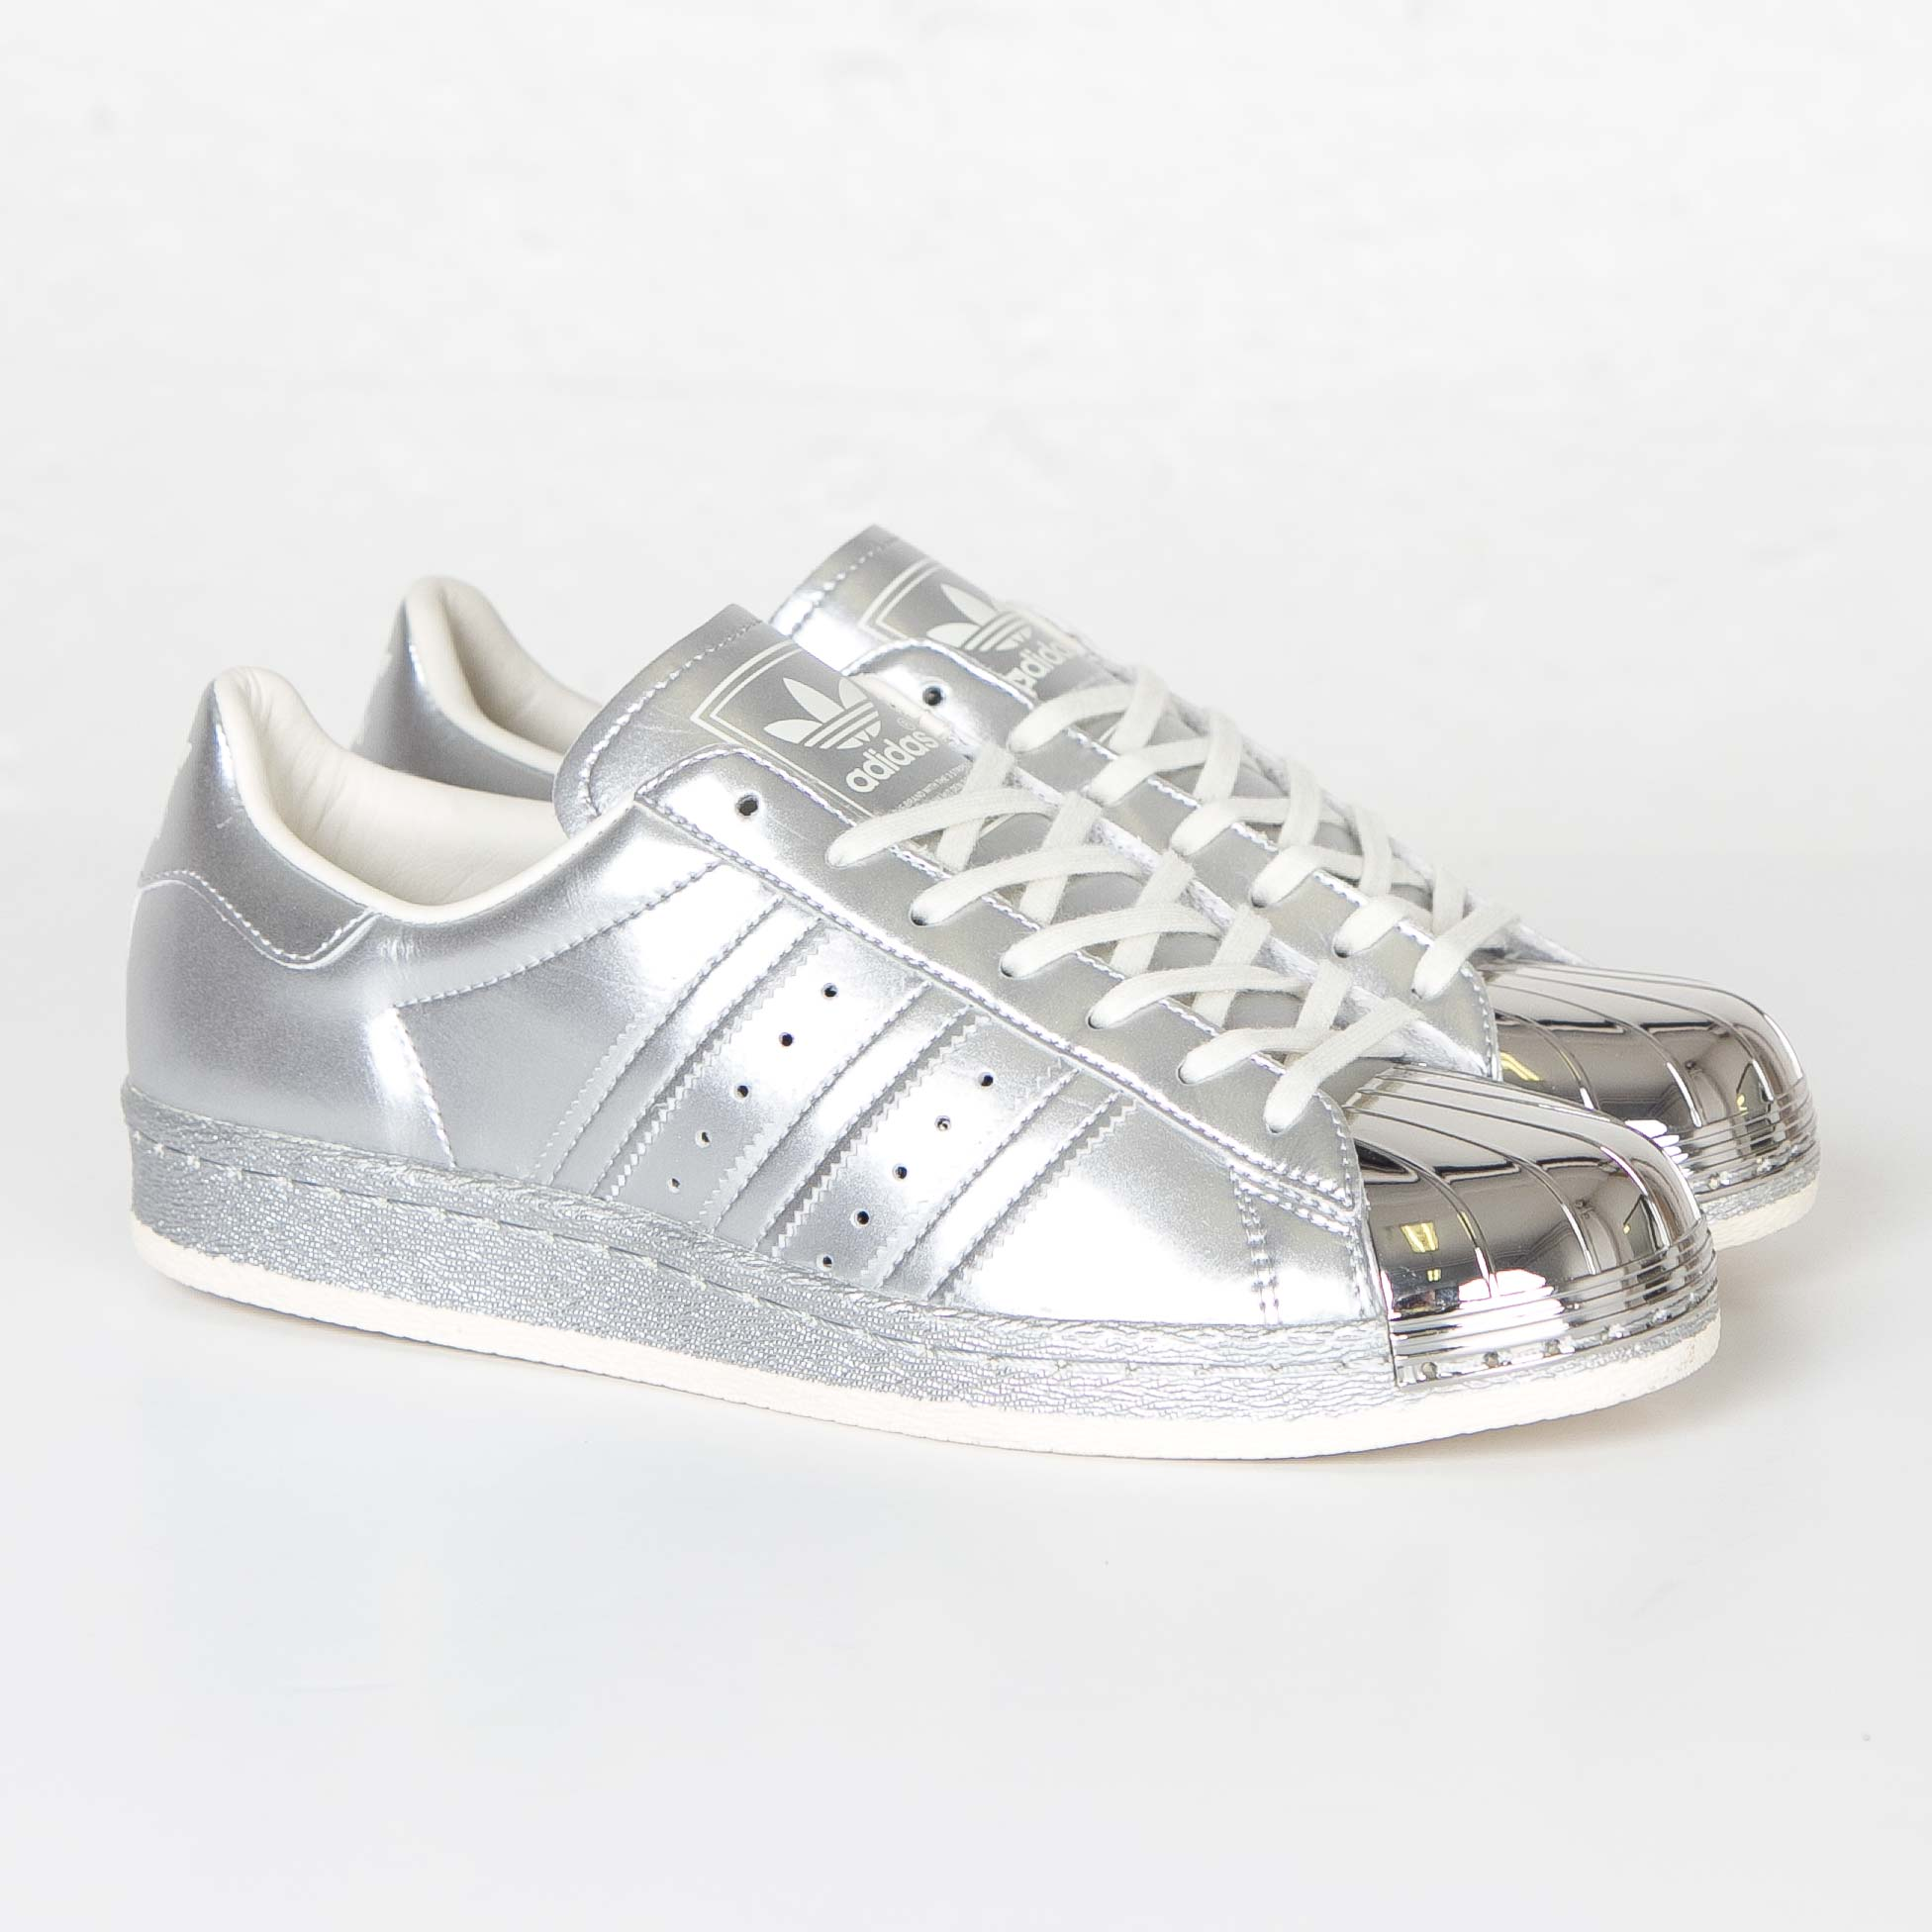 plus de photos 94f0f 402b0 adidas Superstar 80s Metallic Pack - S82741 - Sneakersnstuff ...